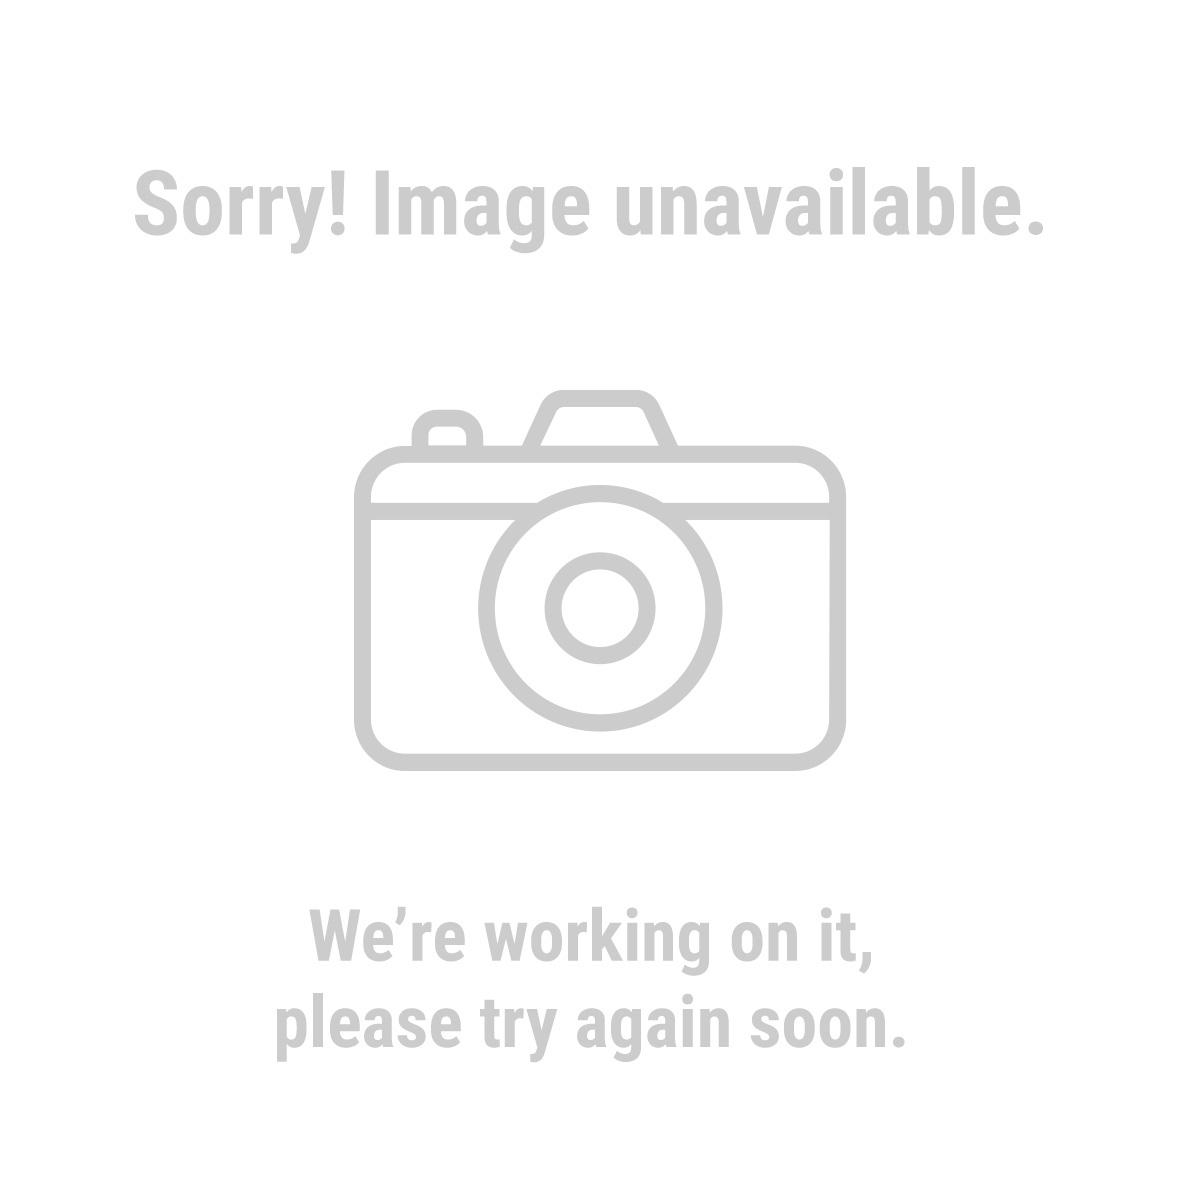 Pacific Hydrostar 94639 12 Volt Marine Utility Water Pump